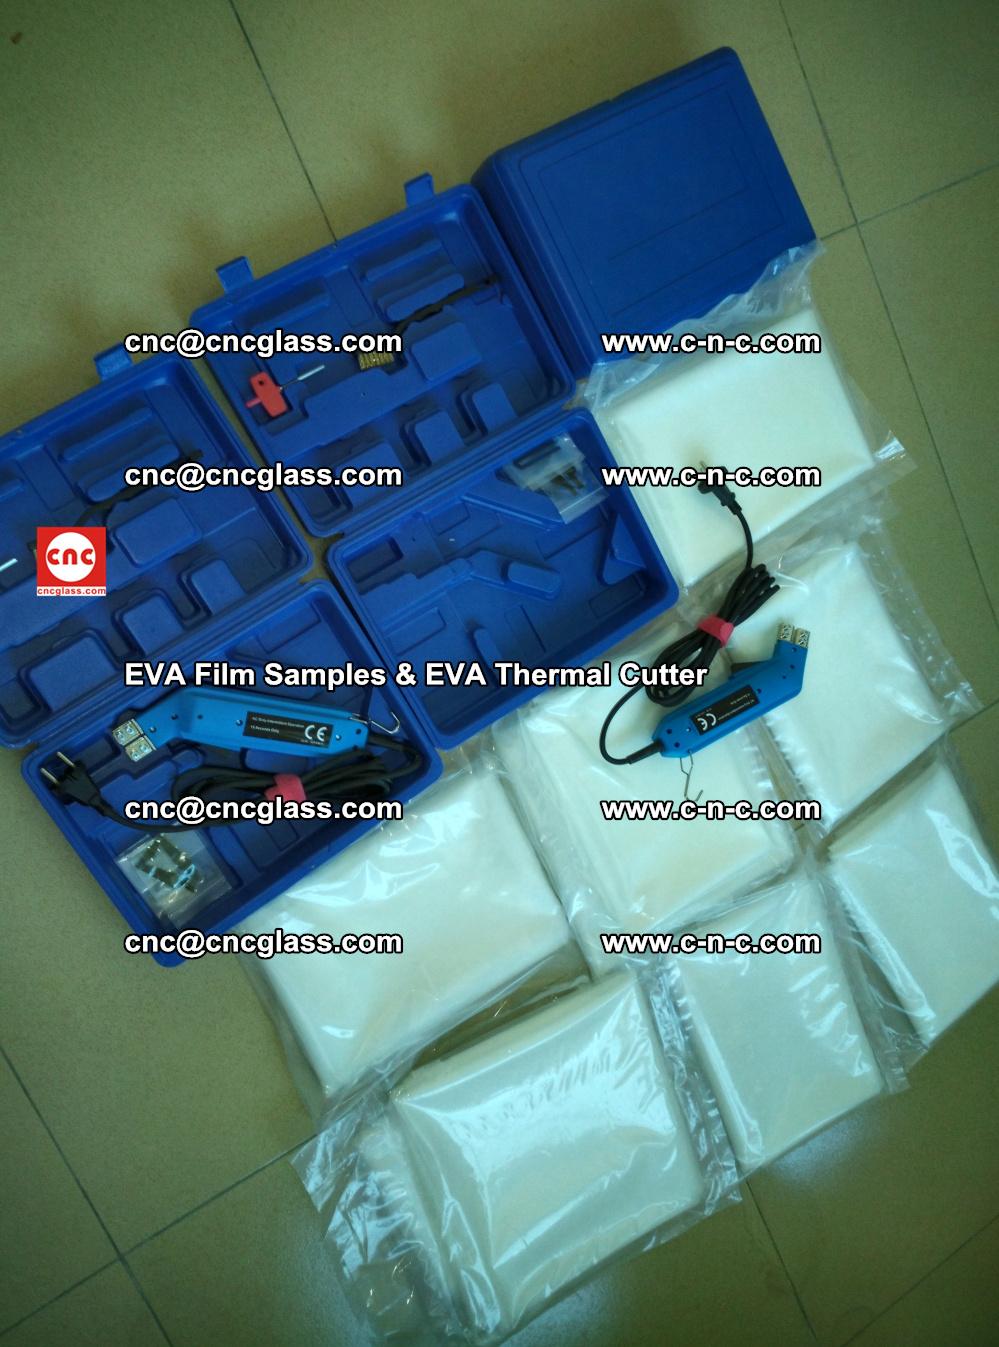 EVAFORCE SUPER CLEAR EVA Film Samples and EVA Thermal Cutter (14)